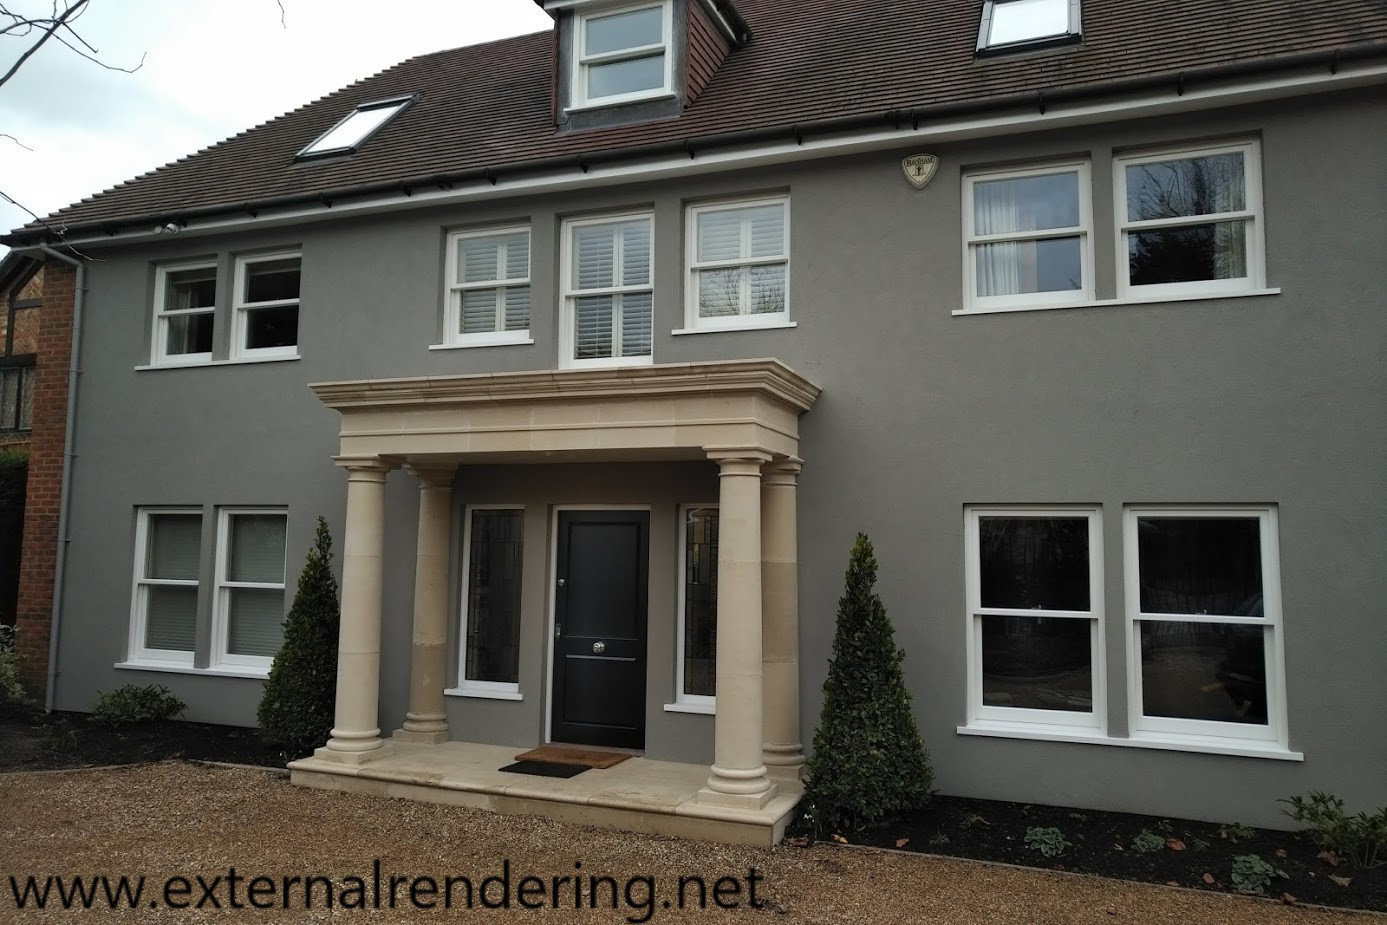 external rendering gallery photos of a render specialist. Black Bedroom Furniture Sets. Home Design Ideas